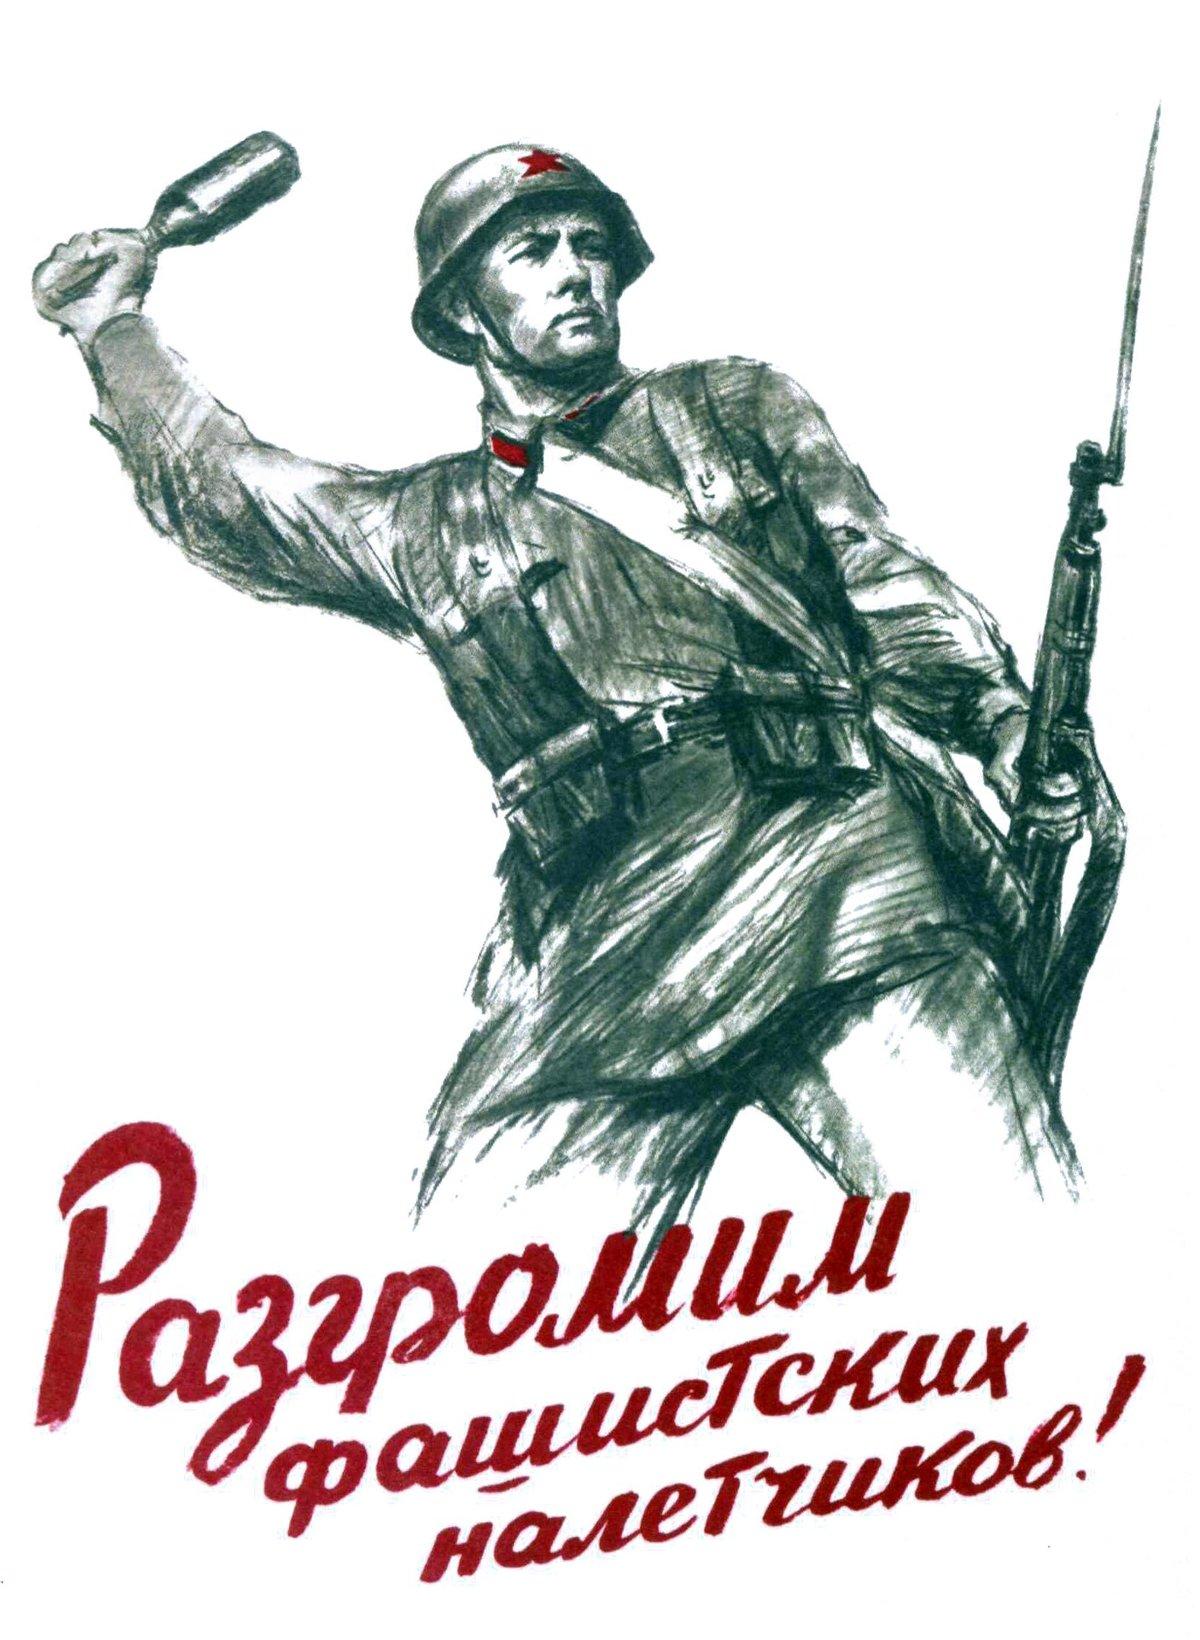 Постер на тему войны